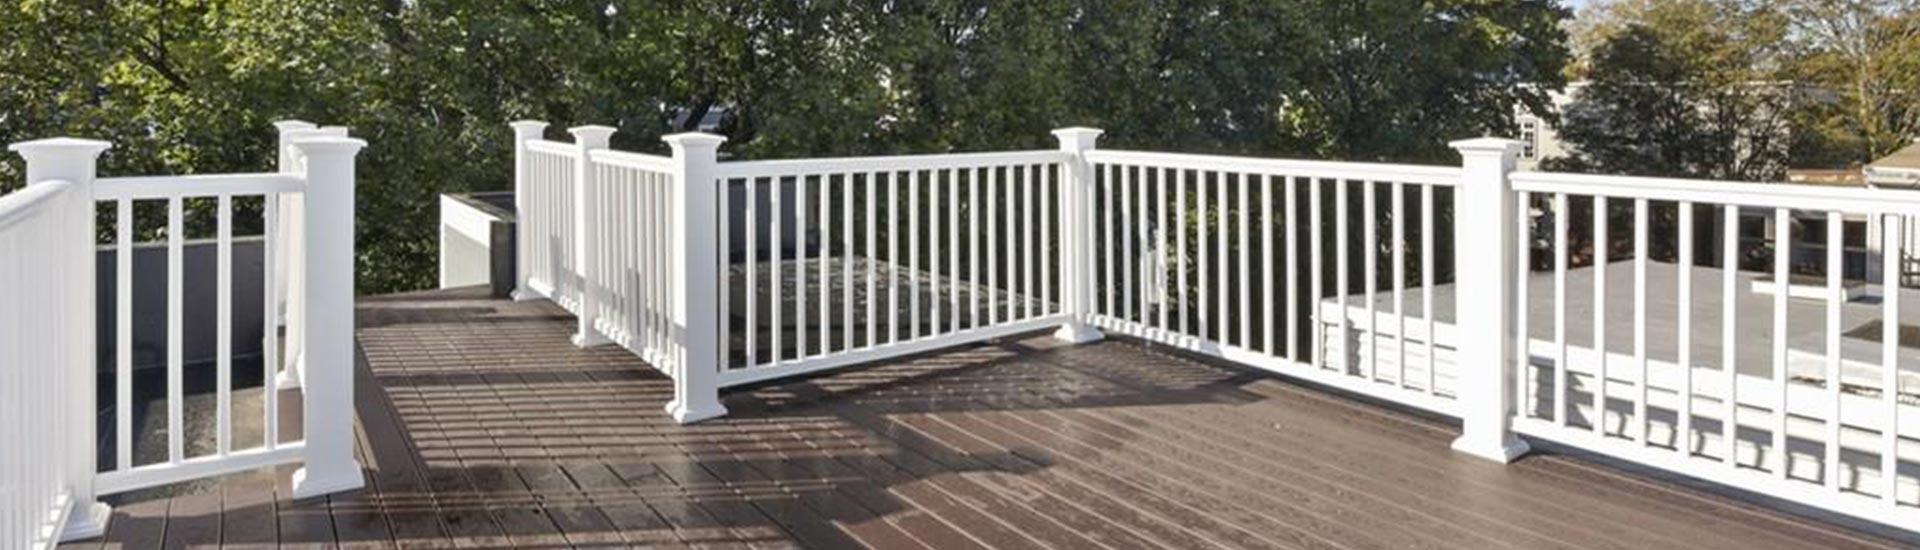 roof-deck-15